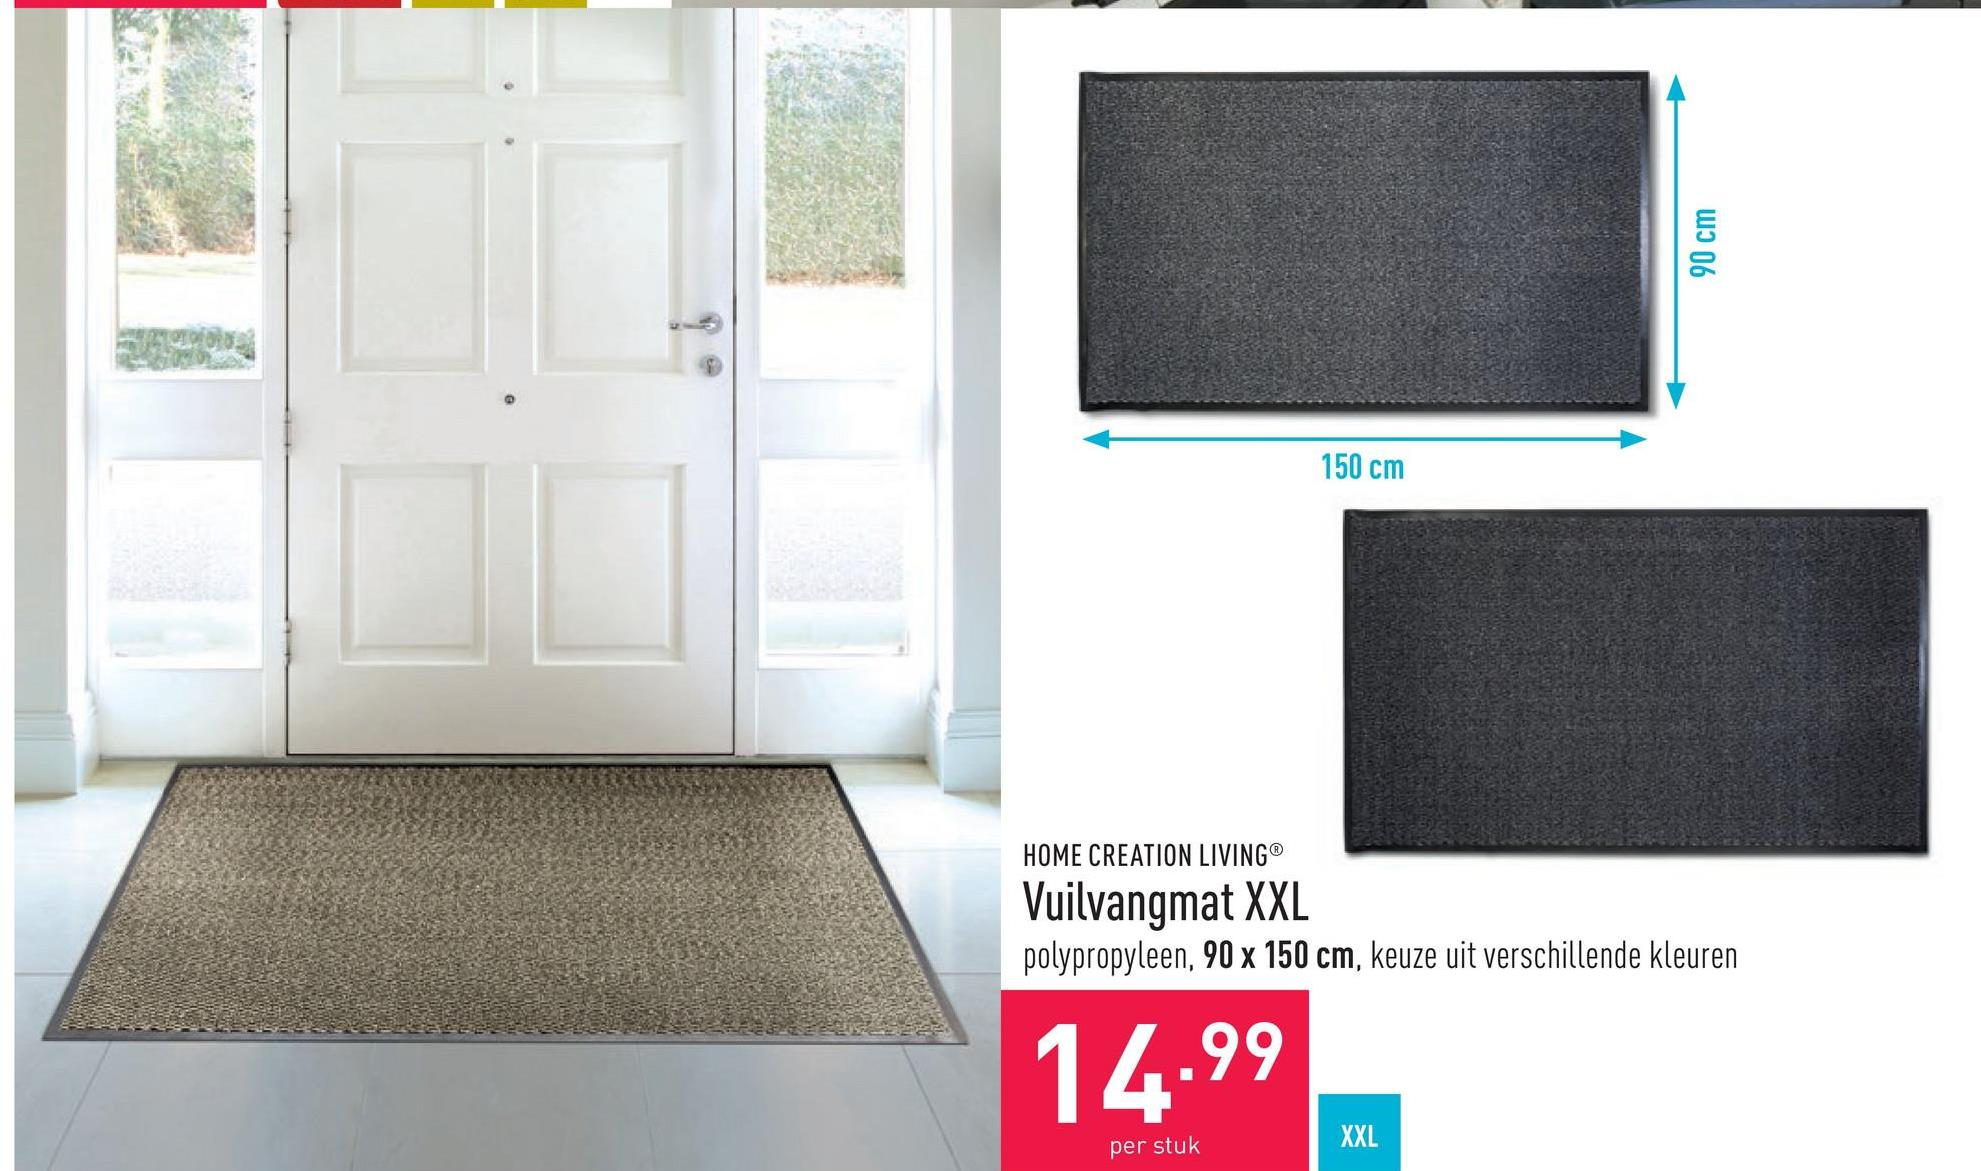 Vuilvangmat XXL polypropyleen, 90 x 150 cm, keuze uit verschillende kleuren